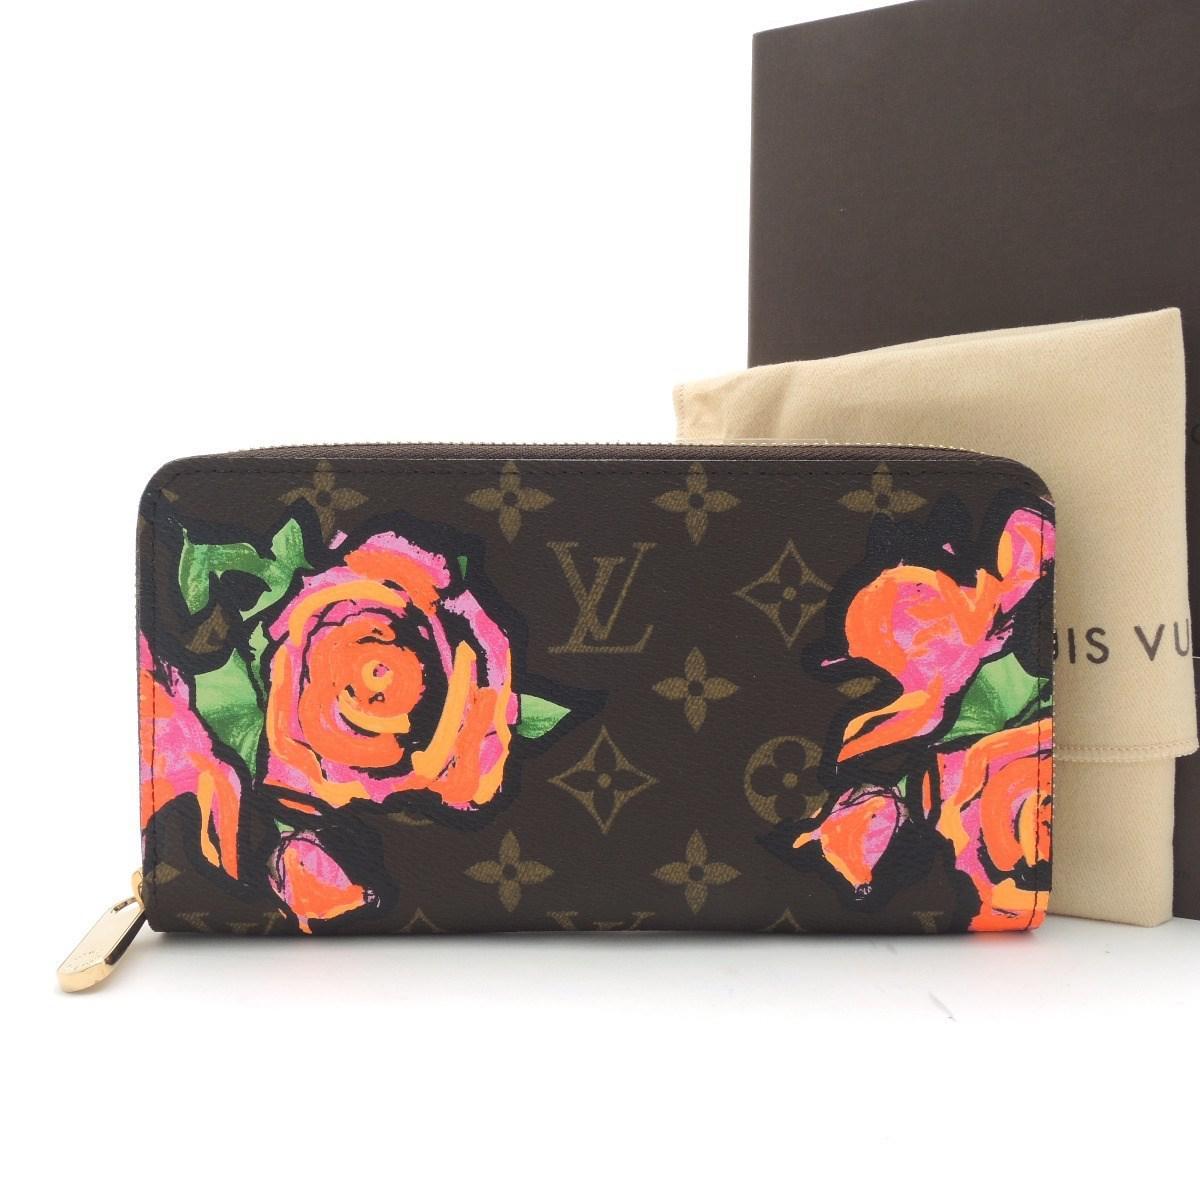 Lyst - Louis Vuitton Monogram Rose Zippy Wallet Rose Bifold Wallet ... cc2d5f312ae